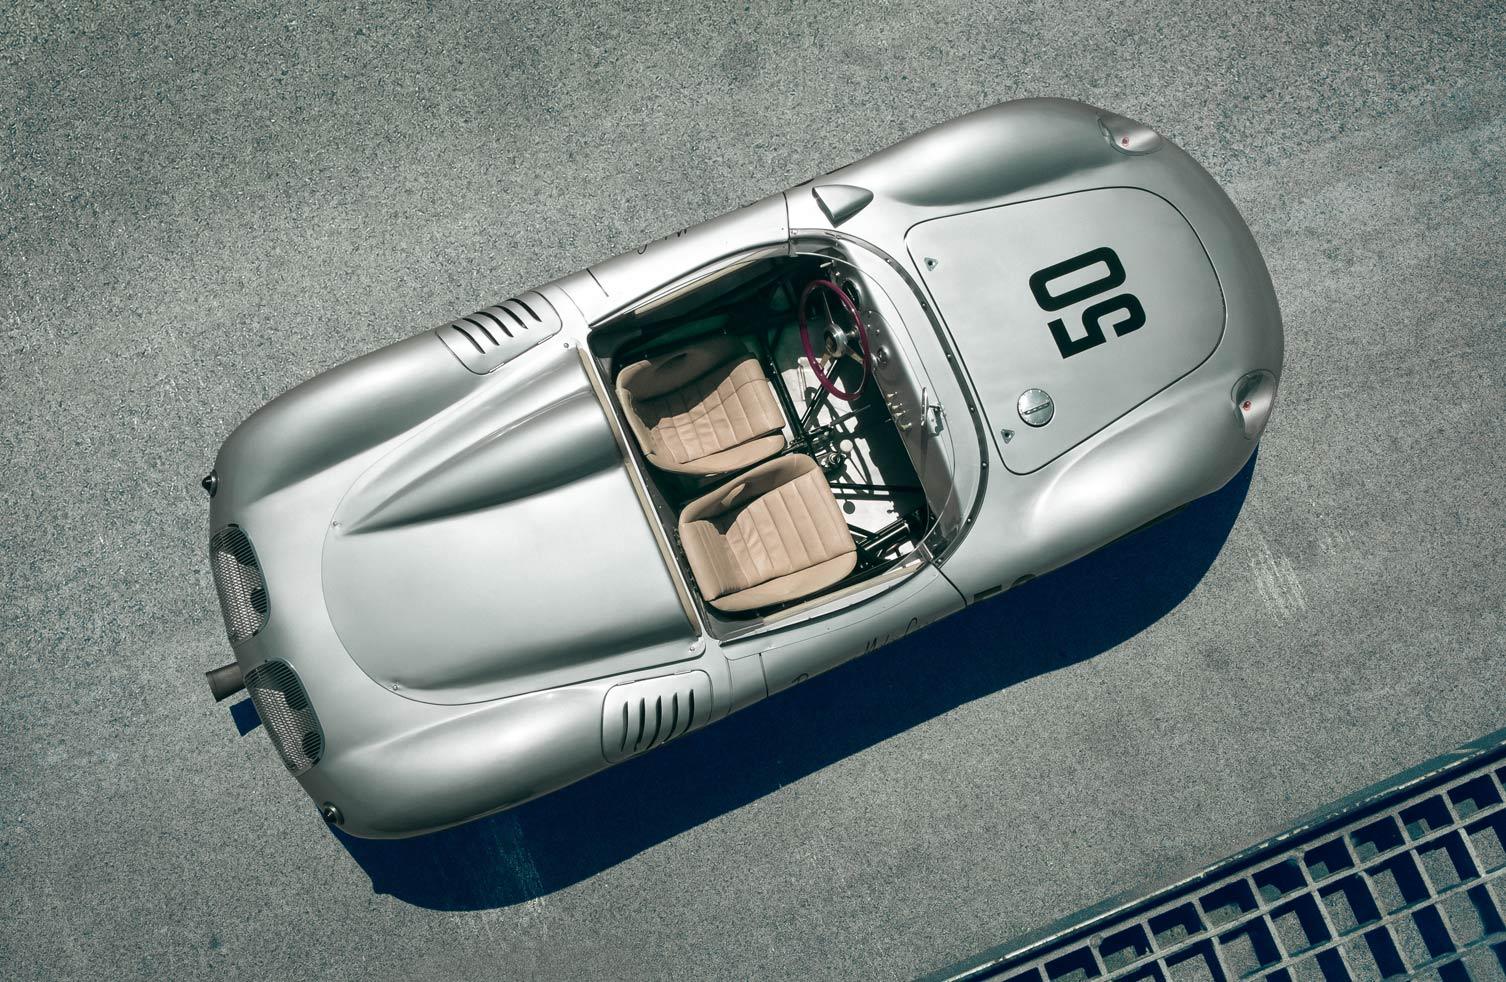 web_Porsche_718RSK_v4